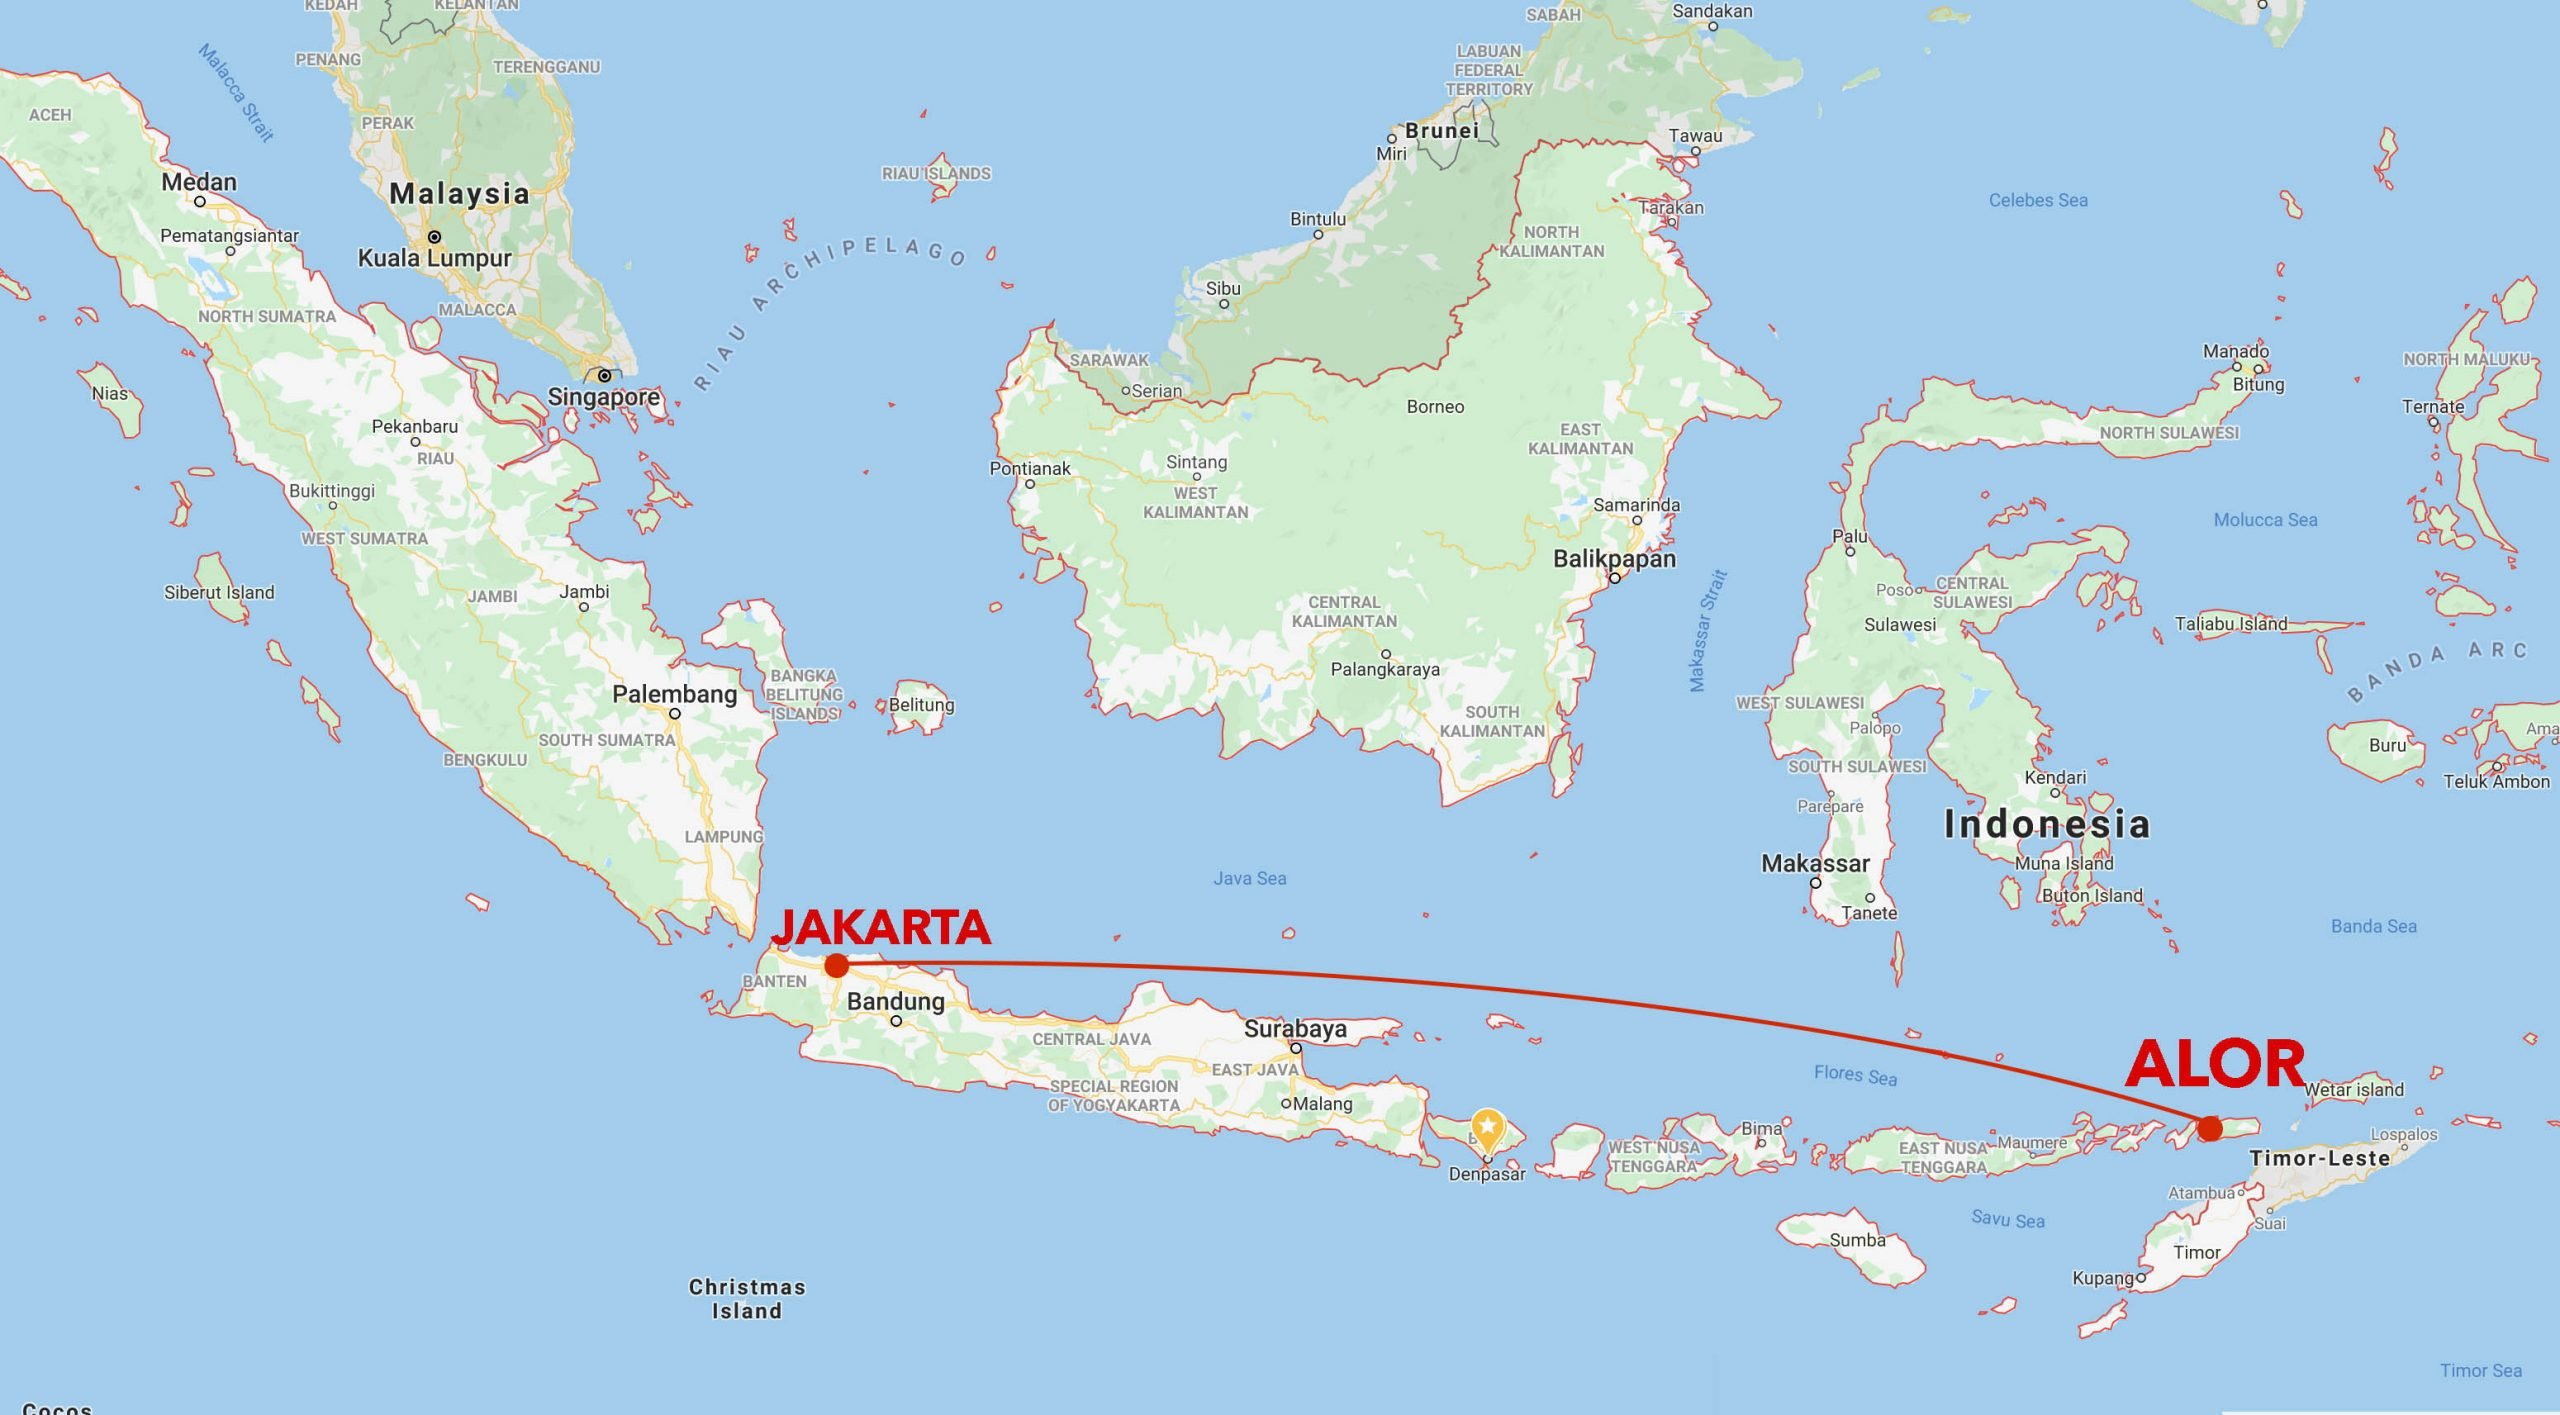 Alor snorkel safari itinerary map